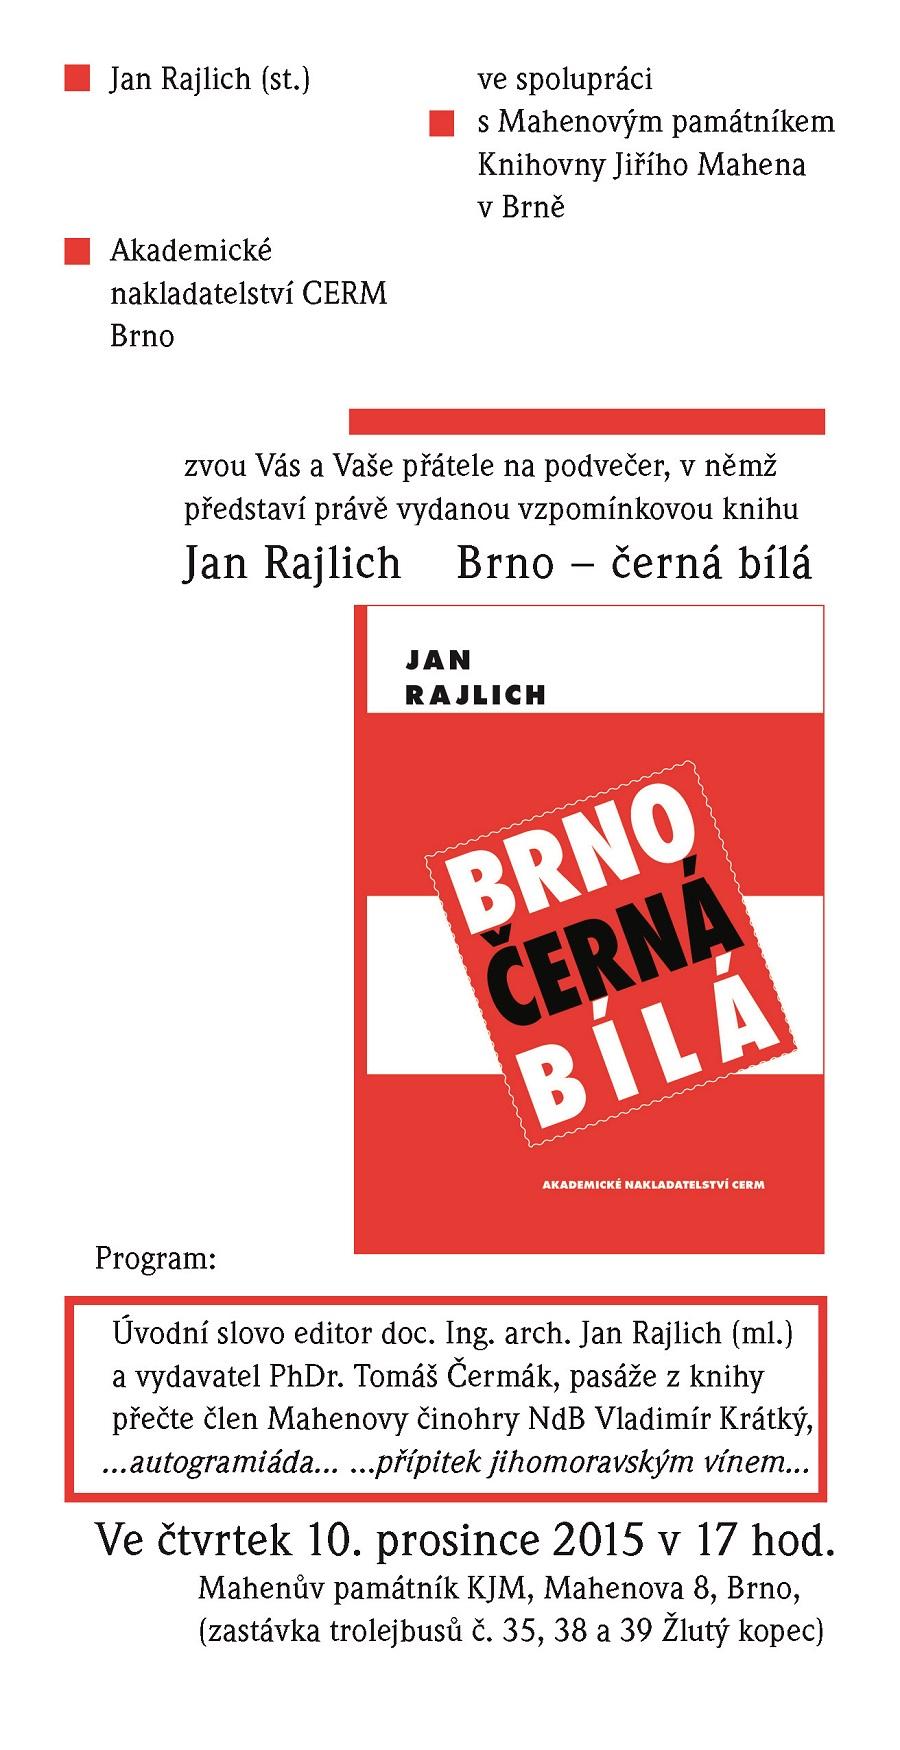 Pozvanka_BrnoCB_MaPa_w_Stránka_1ww